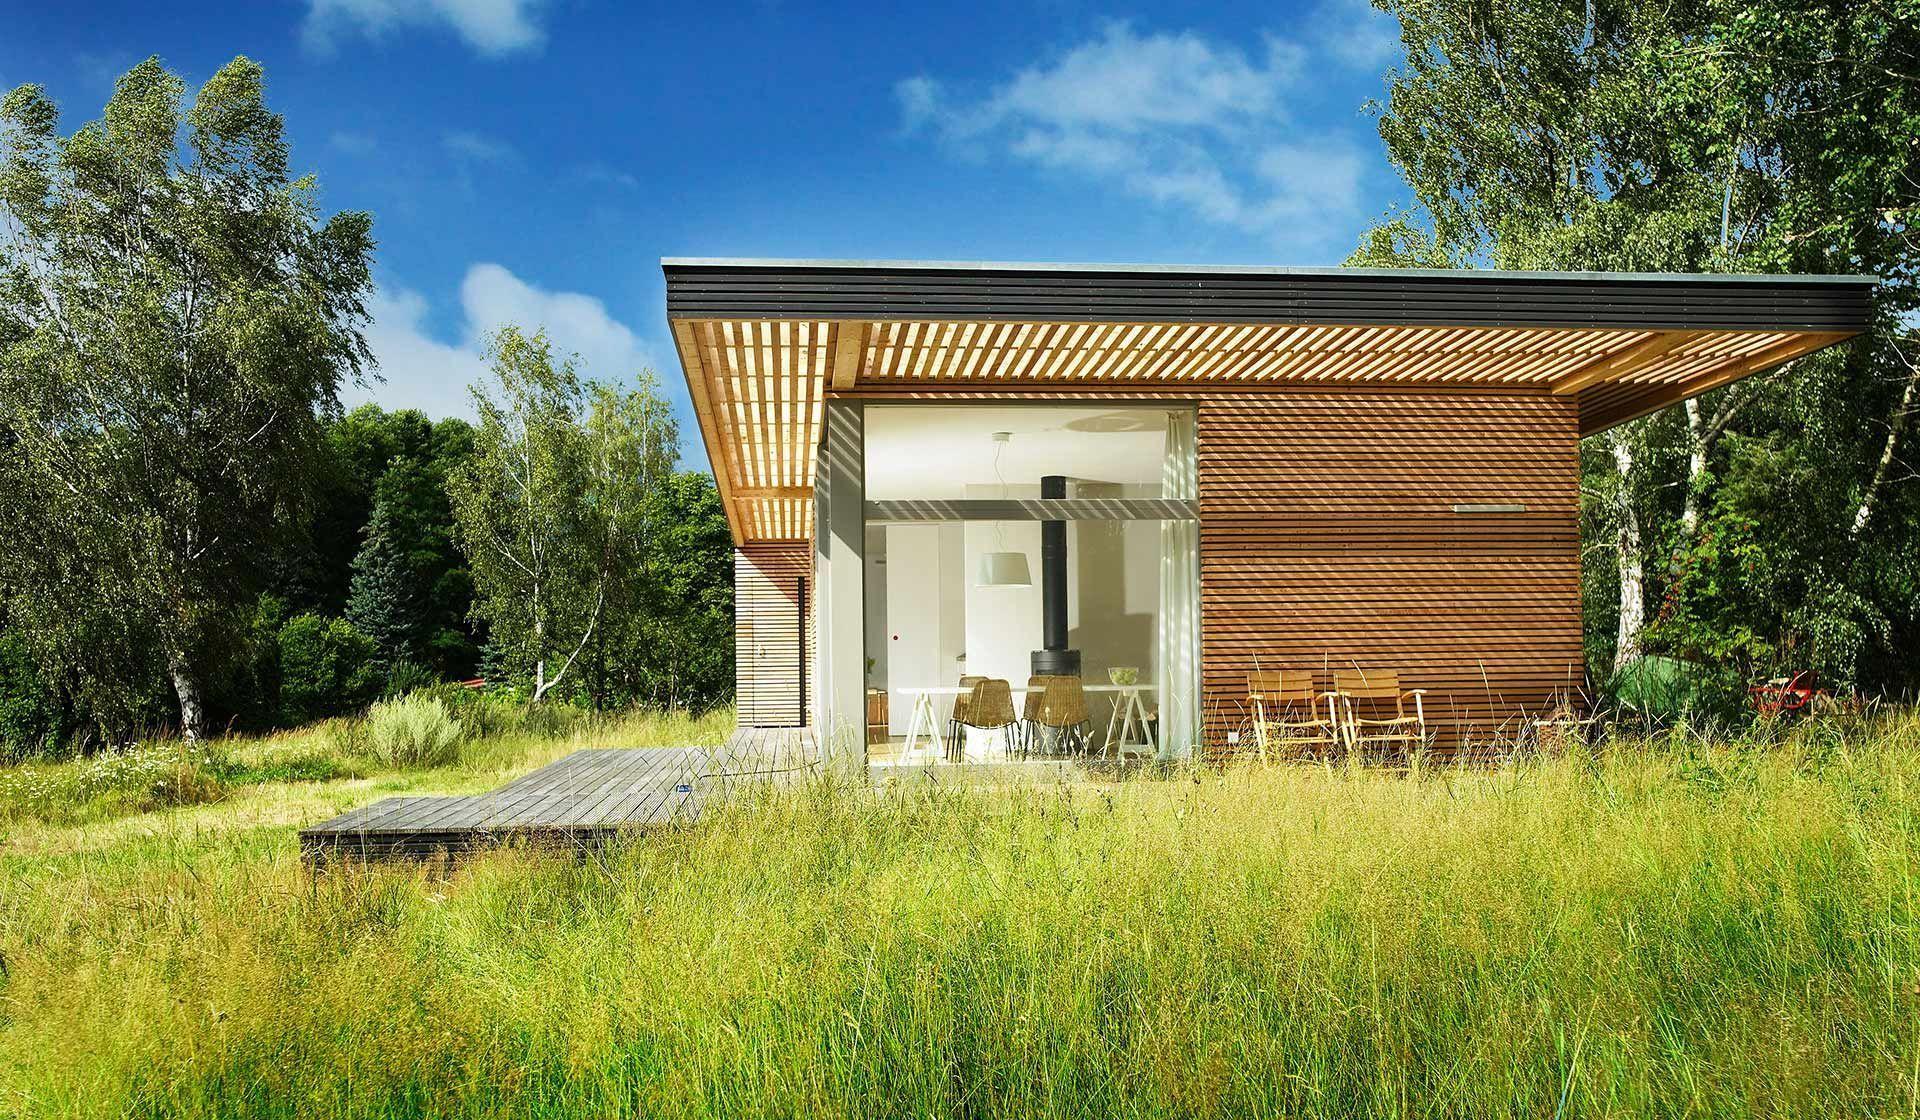 inspired by scandinavian summerhouse culture sommerhaus piu is a